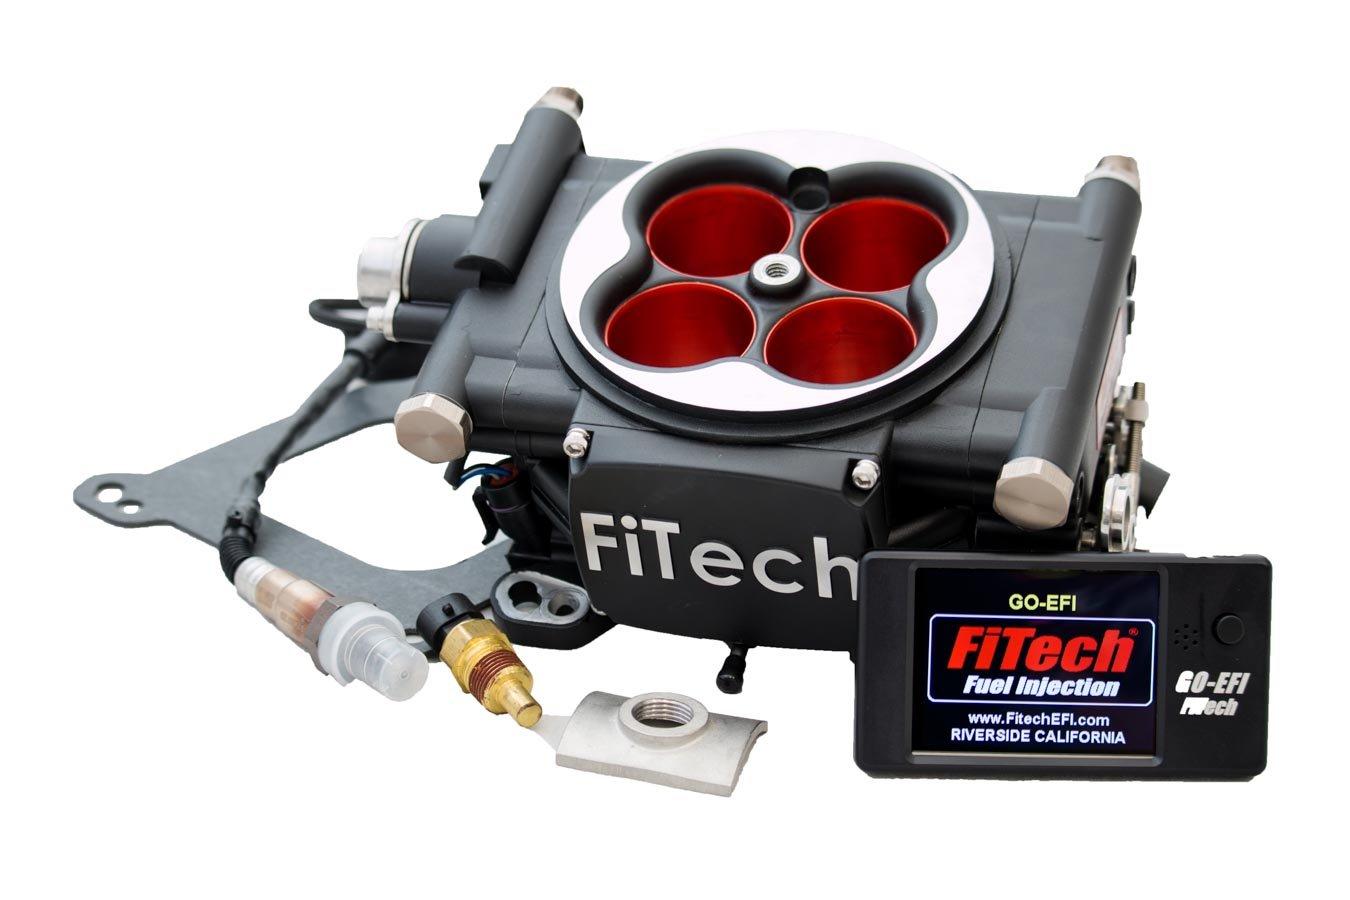 Matte Black FiTech Fuel Injection Go EFI 4-600 HP System Power Adder 30004